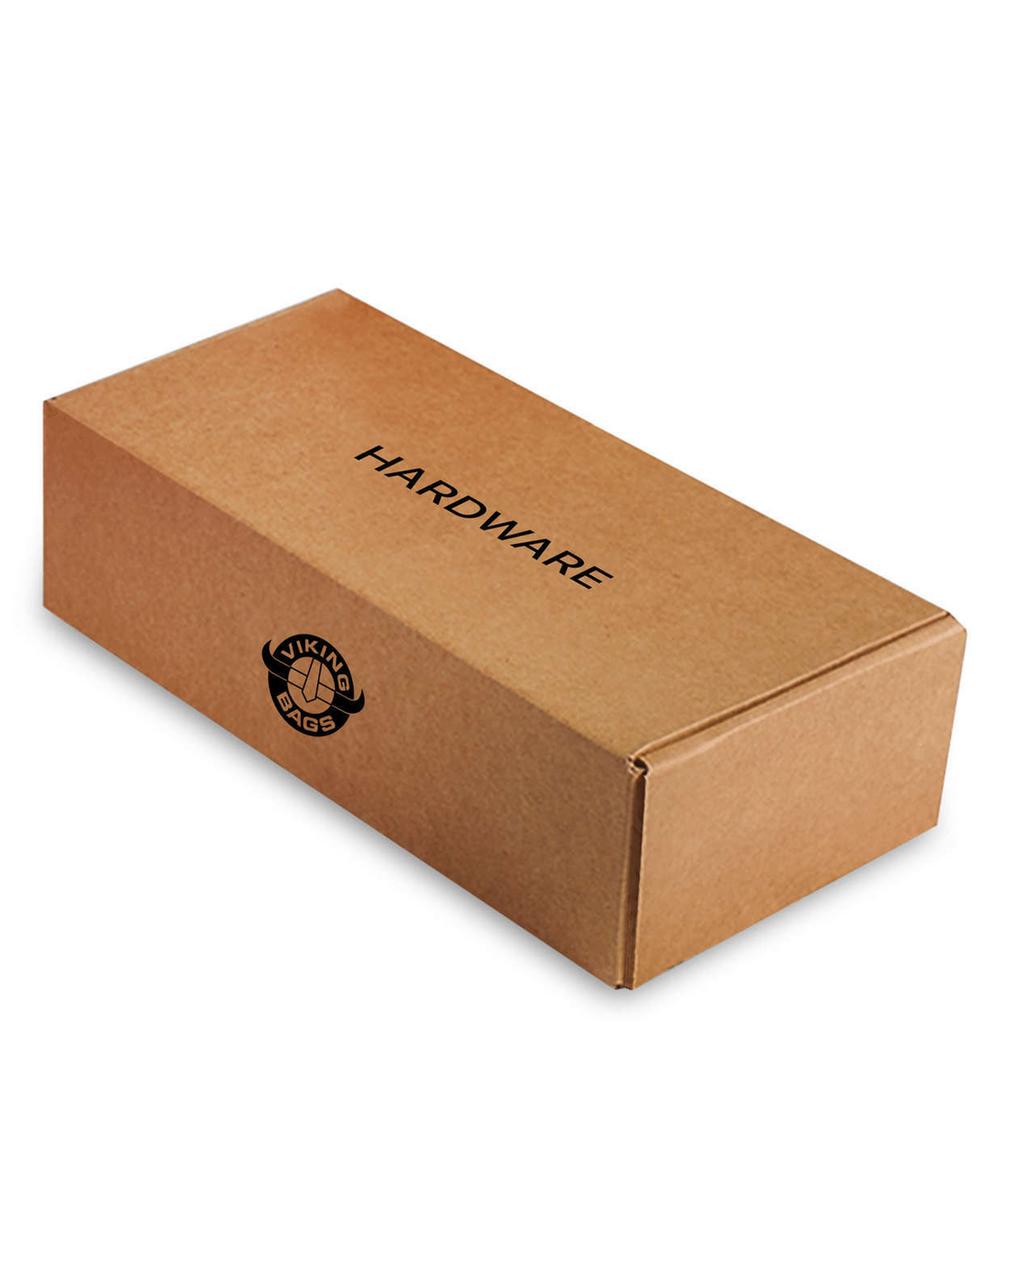 Suzuki Boulevard C90,VL1500, Intruder Pinnacle Saddlebags Hardware Box